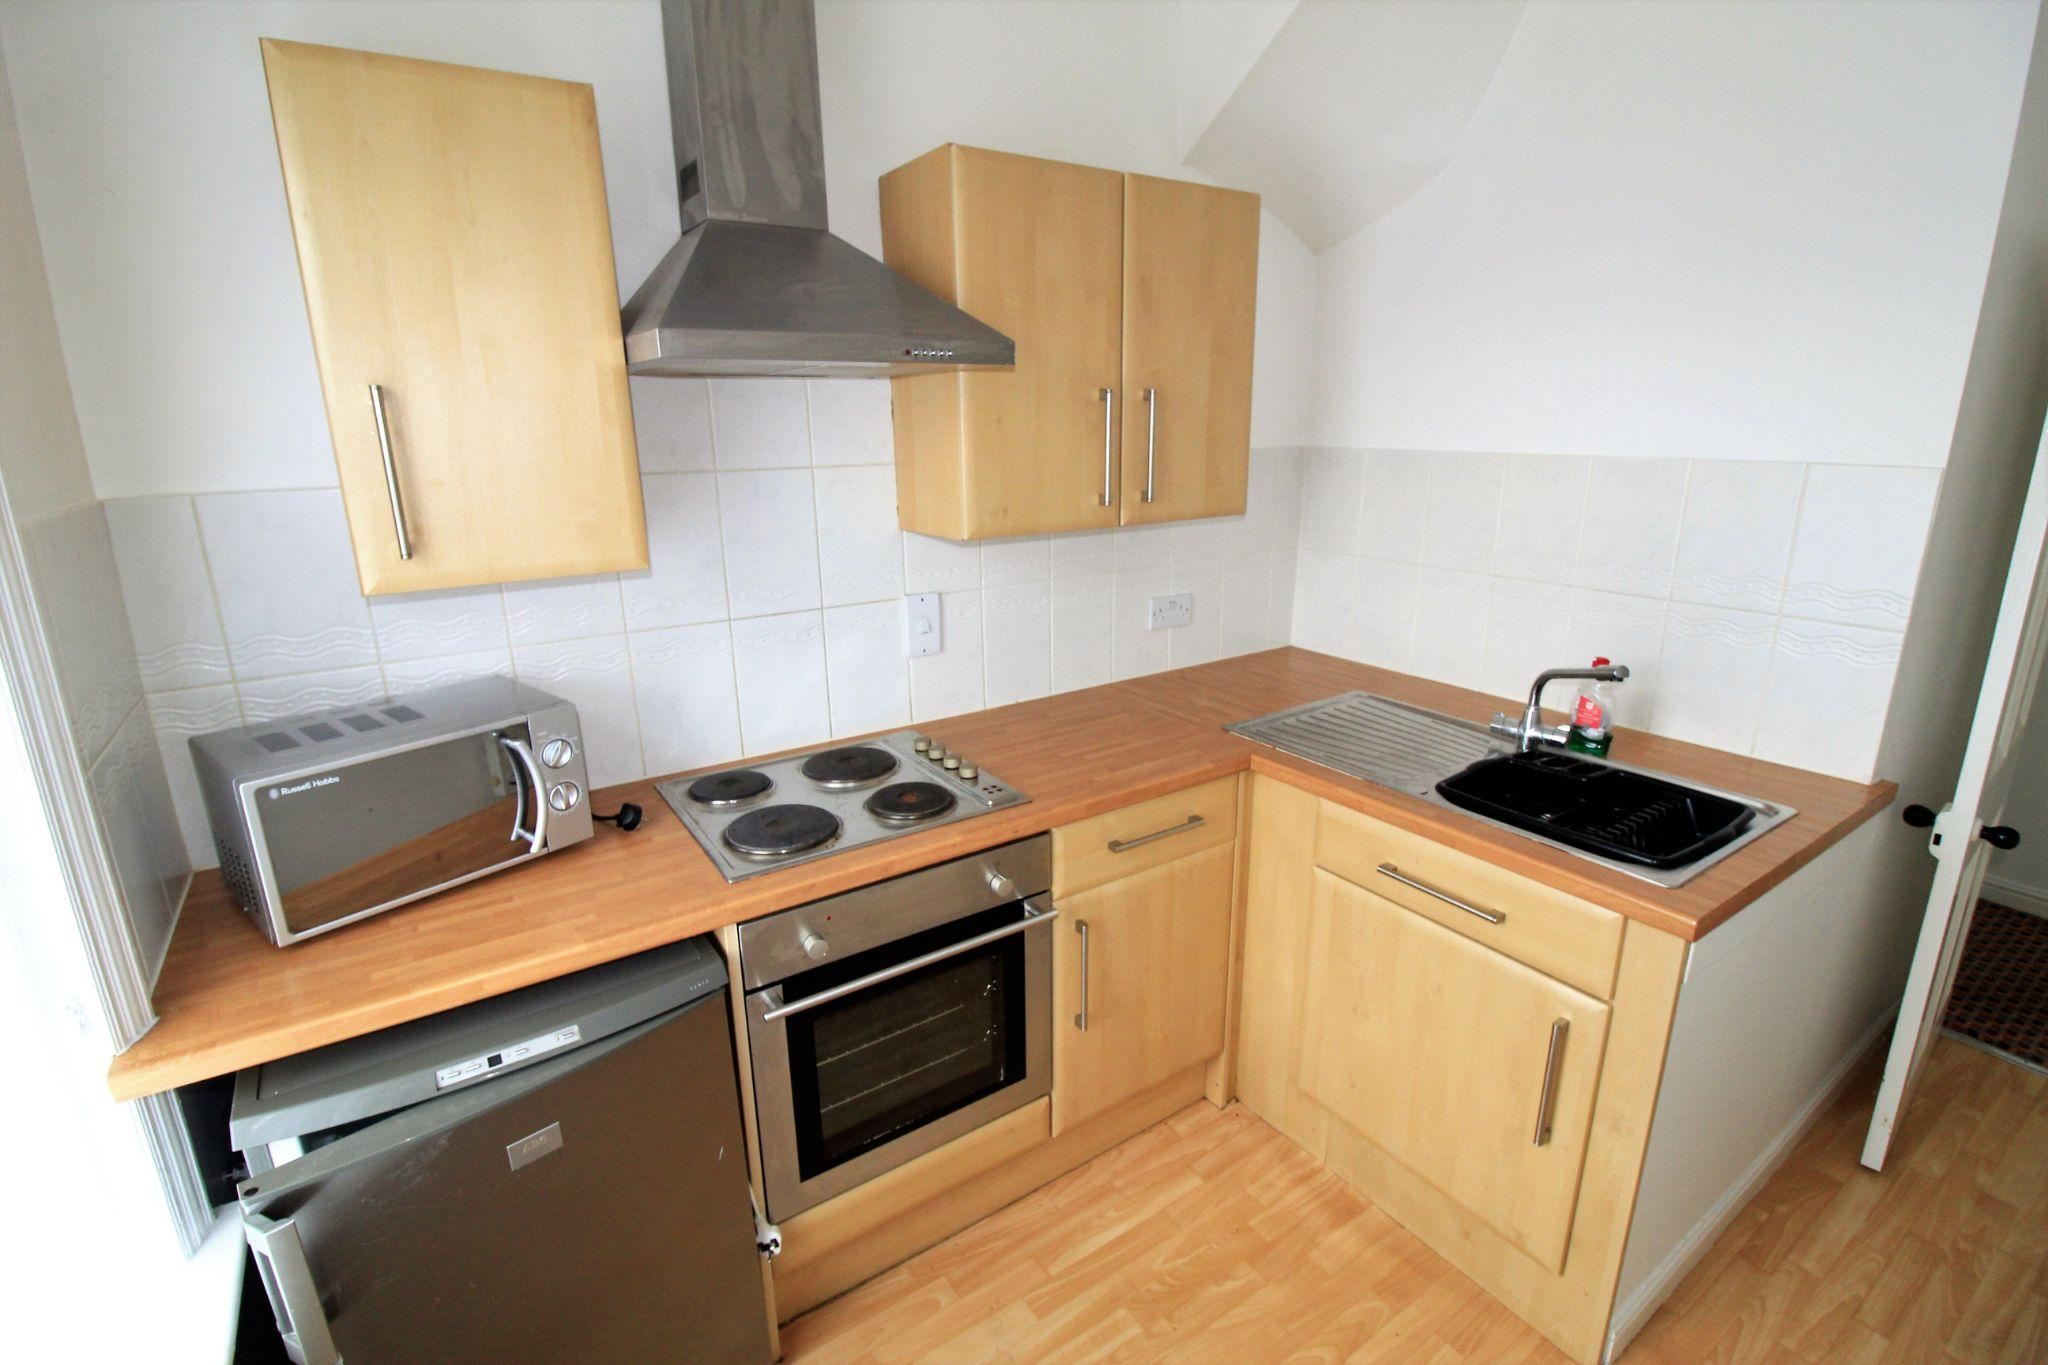 1 bedroom flat flat/apartment Let in Huddersfield - Kitchen